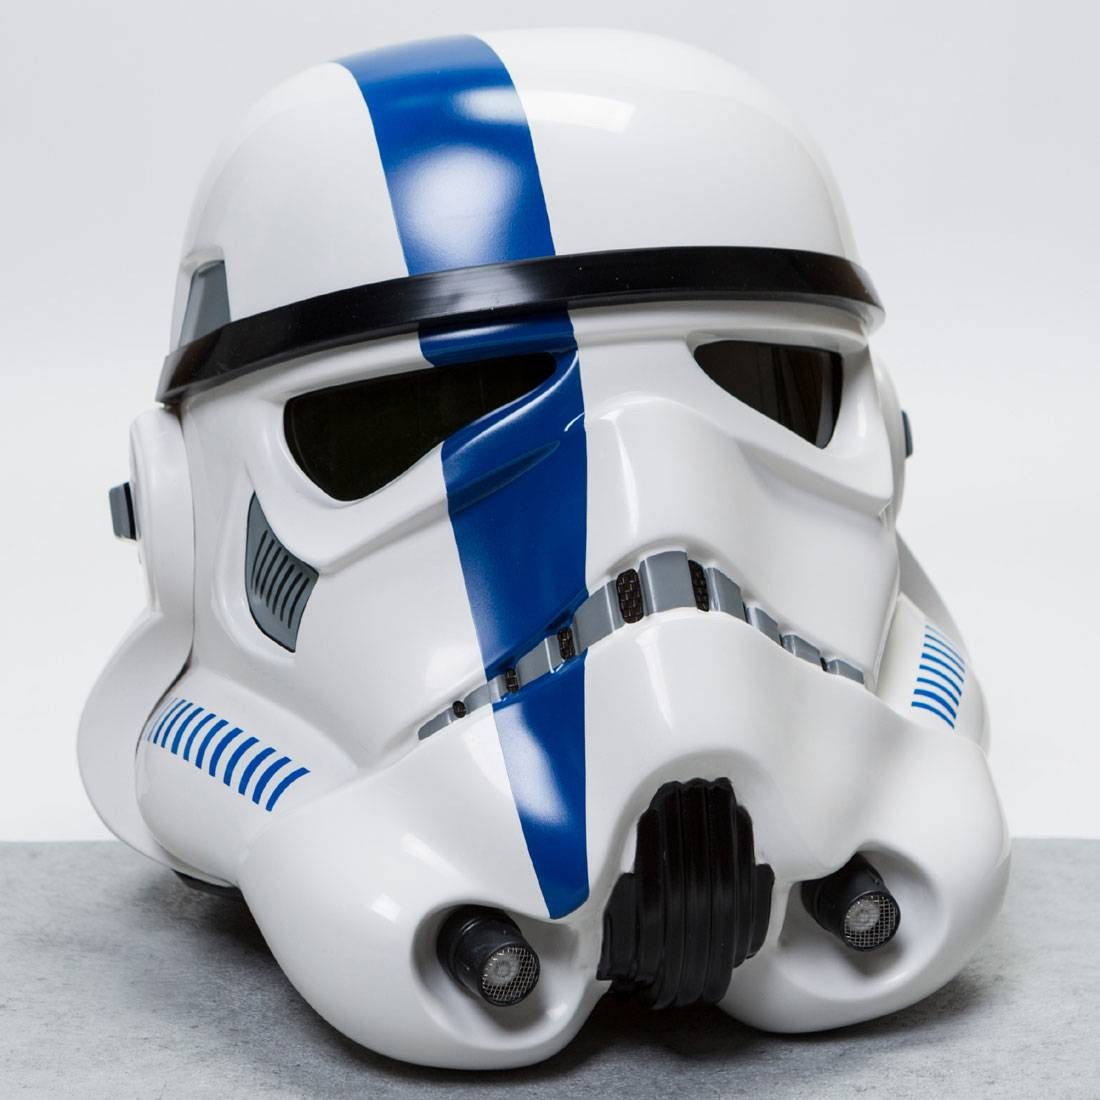 ANOVOS Star Wars EP IV A New Hope Imperial Stormtrooper TK Commander Helmet (blue)